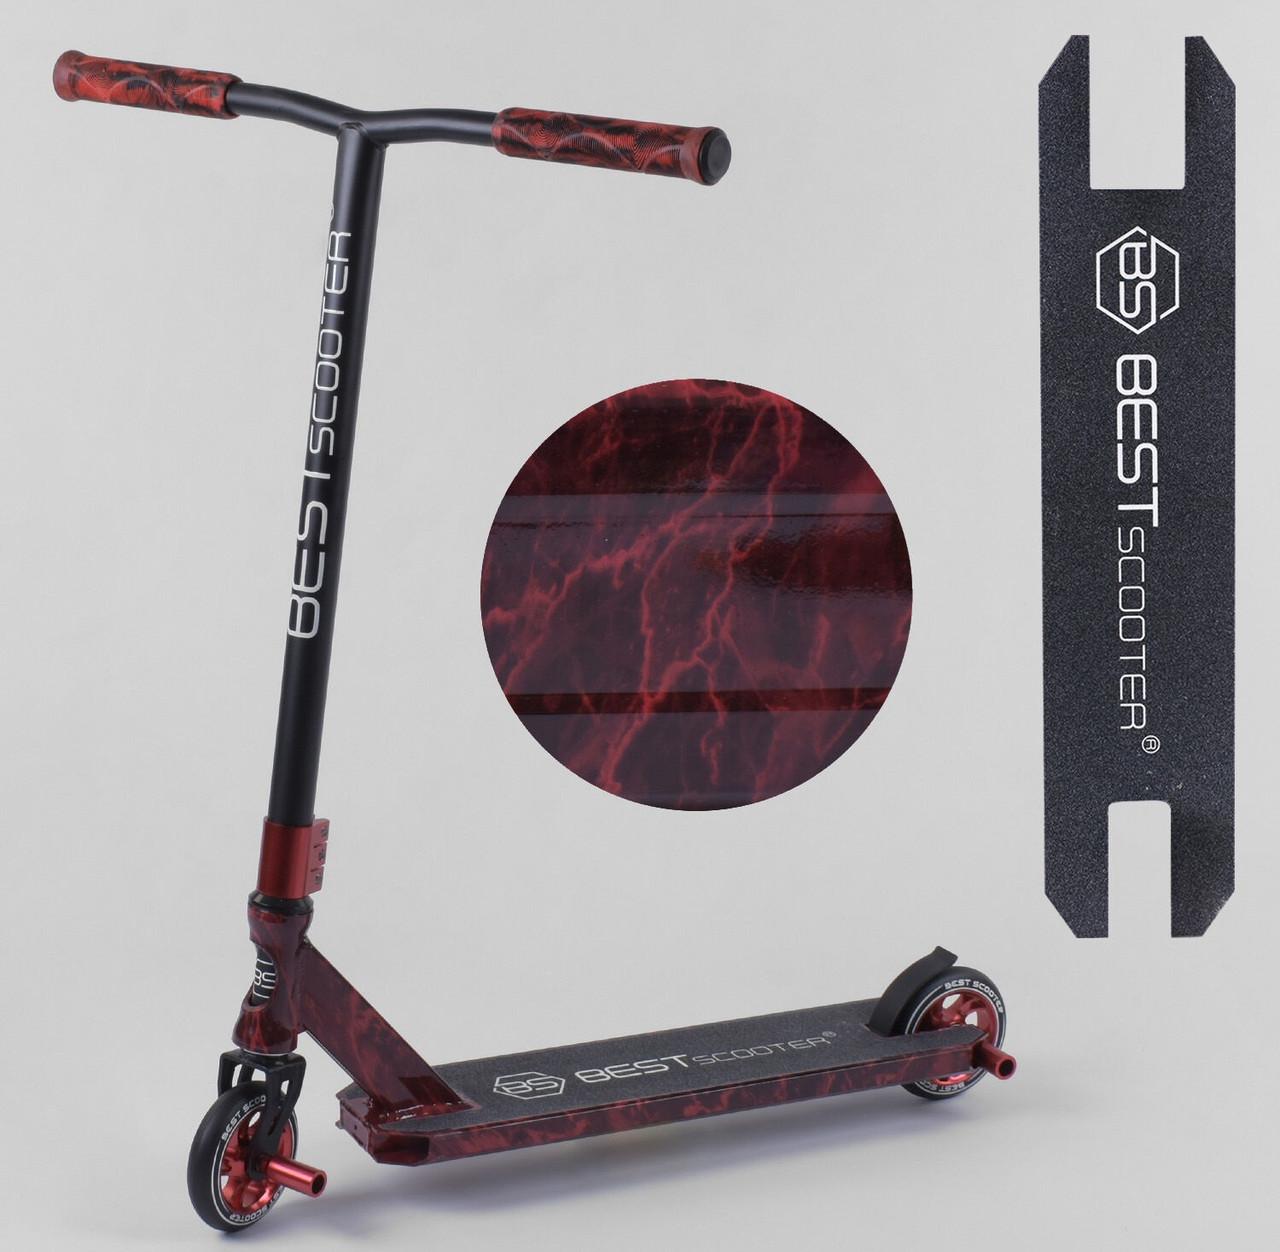 Самокат трюковой Best Scooter hic